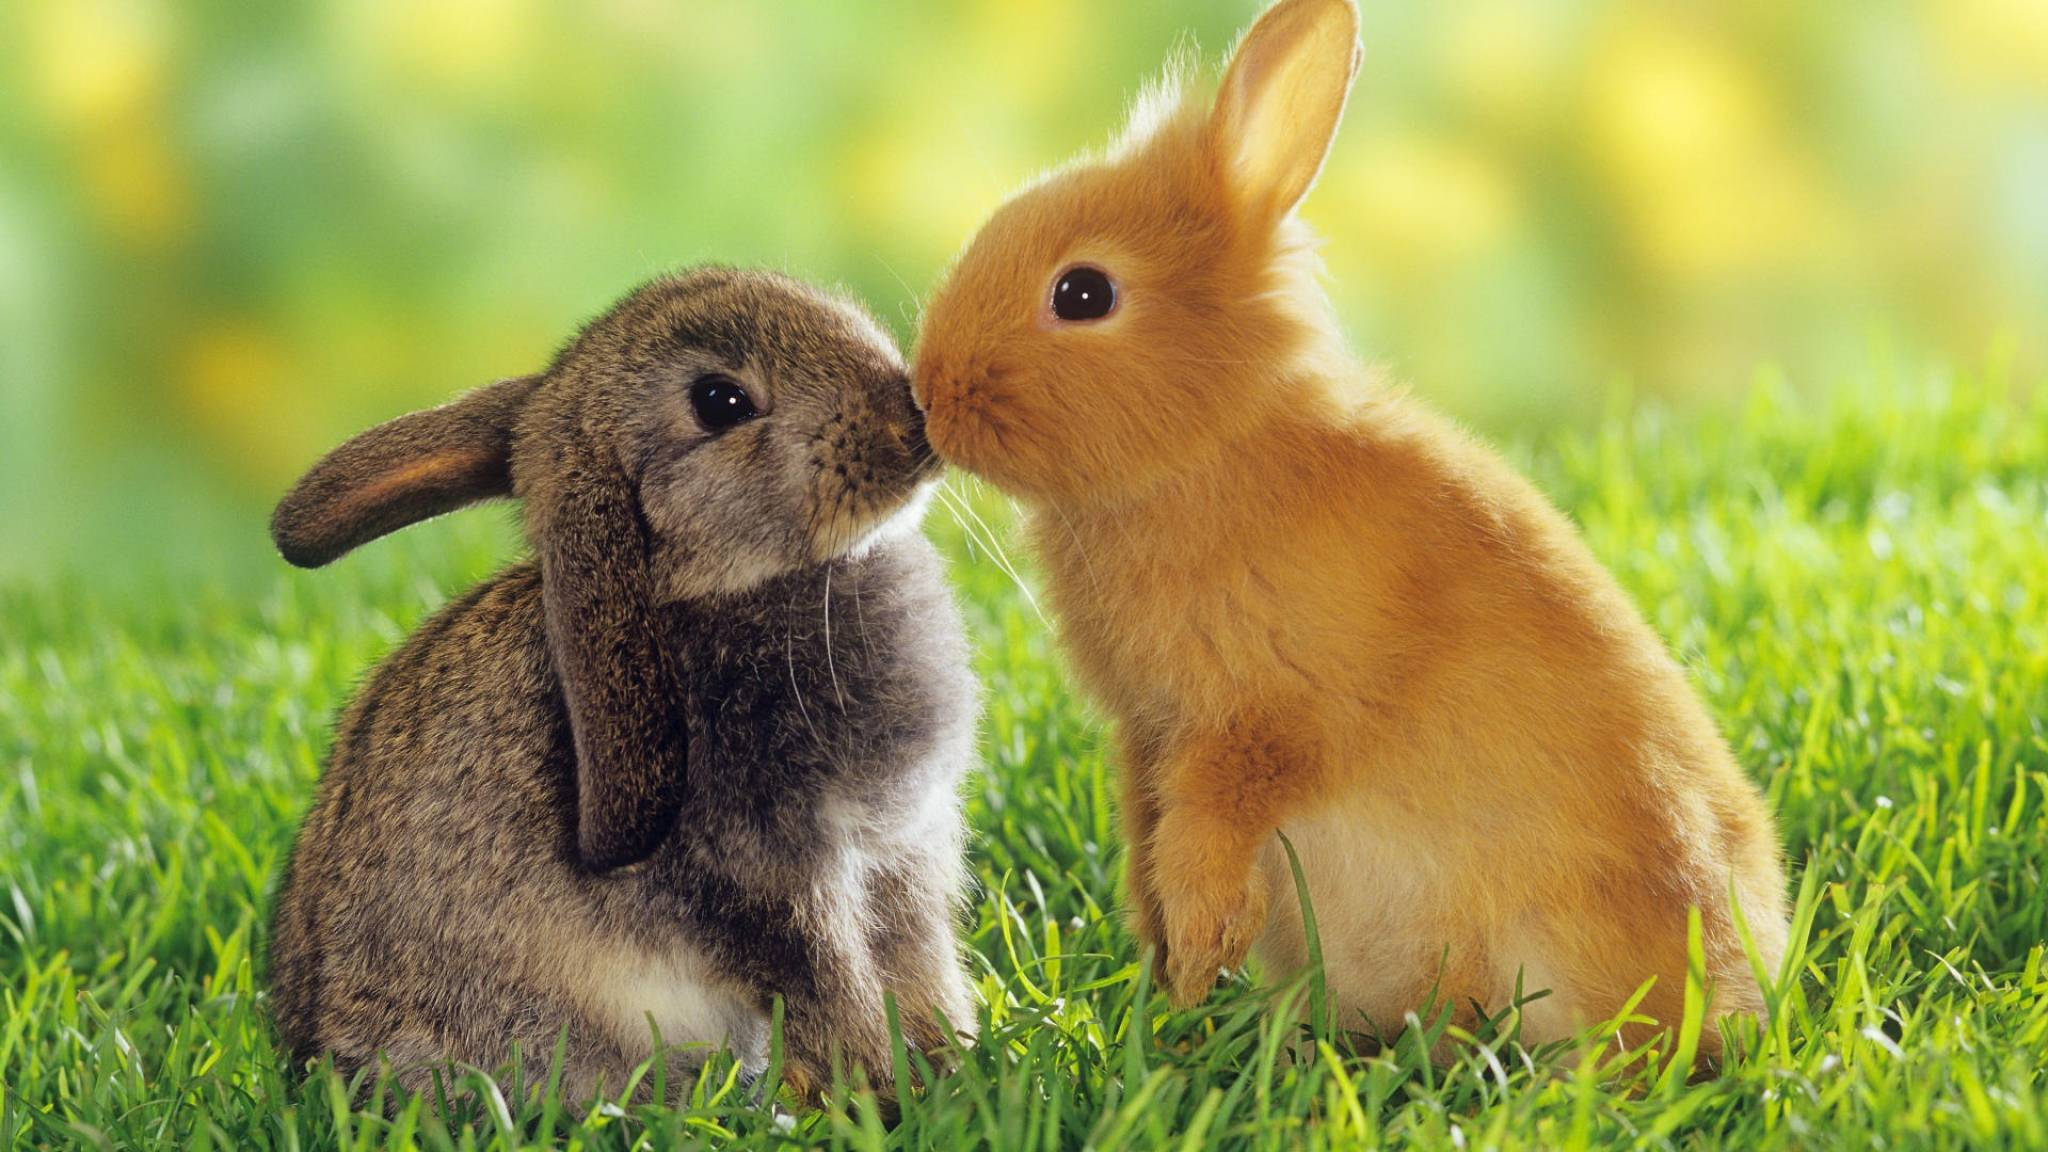 Rabbit Wallpapers Top Free Rabbit Backgrounds Wallpaperaccess